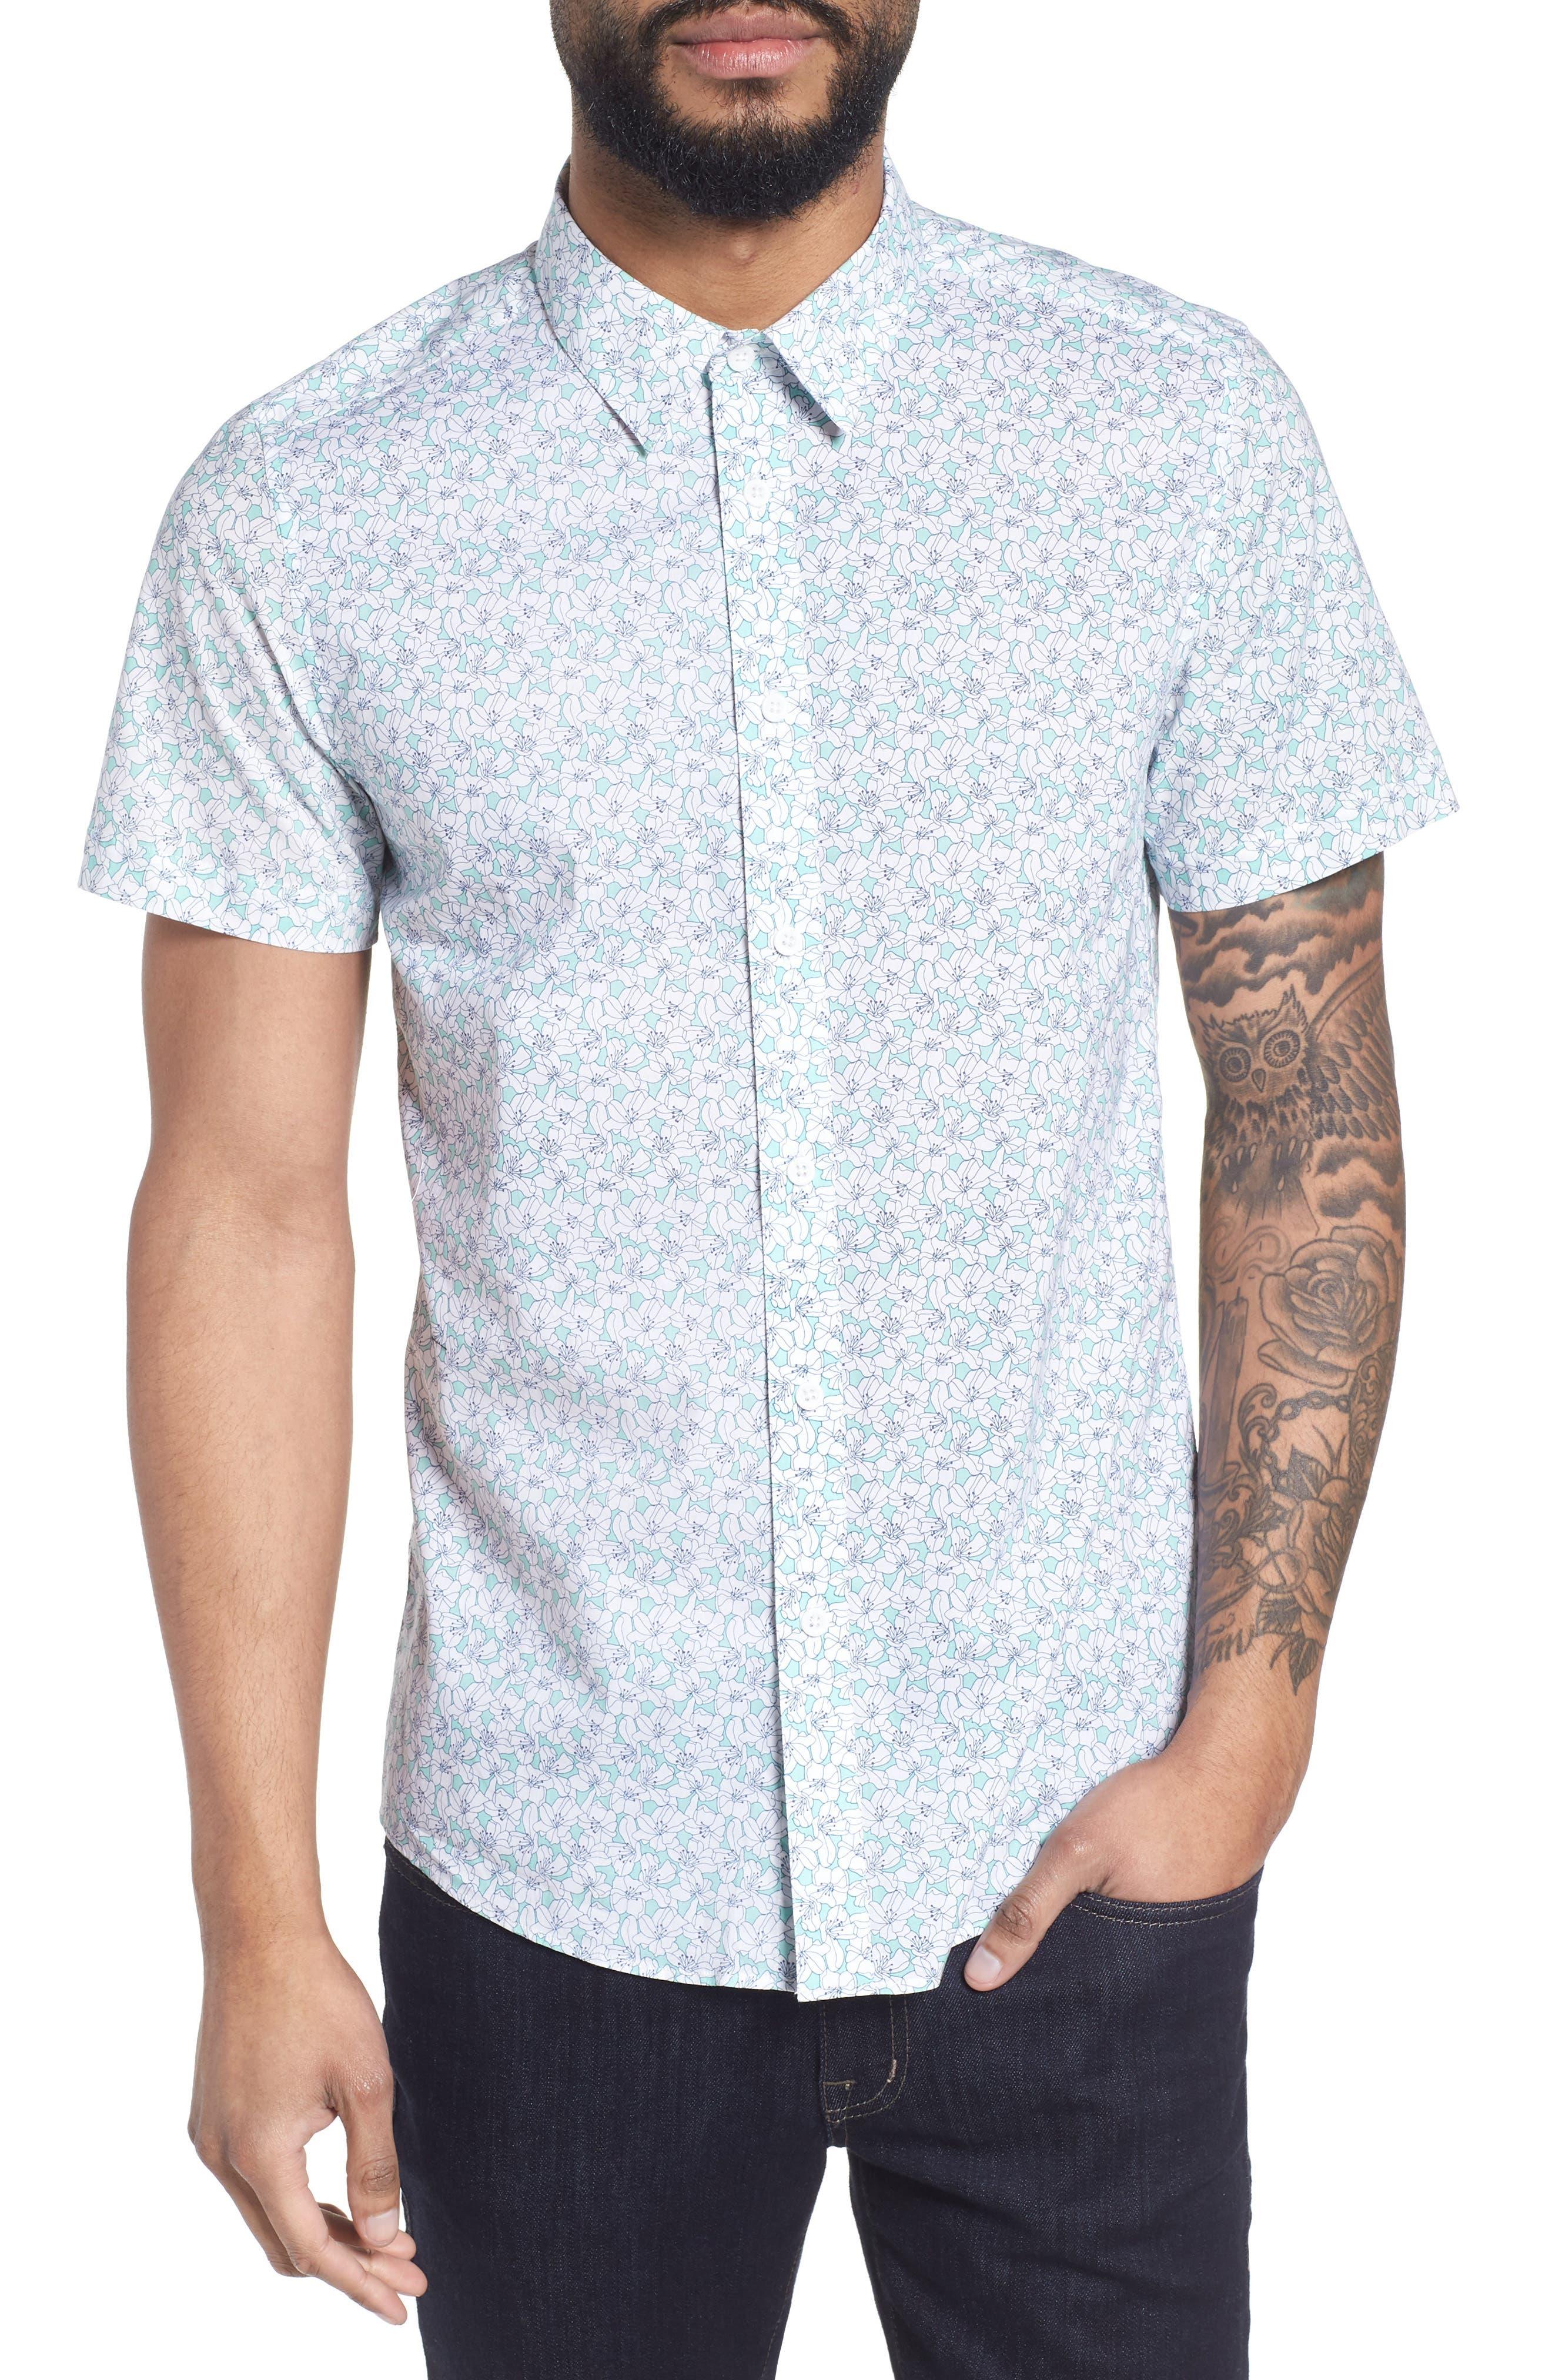 TWENTYMETRICTONS Slim Flit Floral Woven Shirt